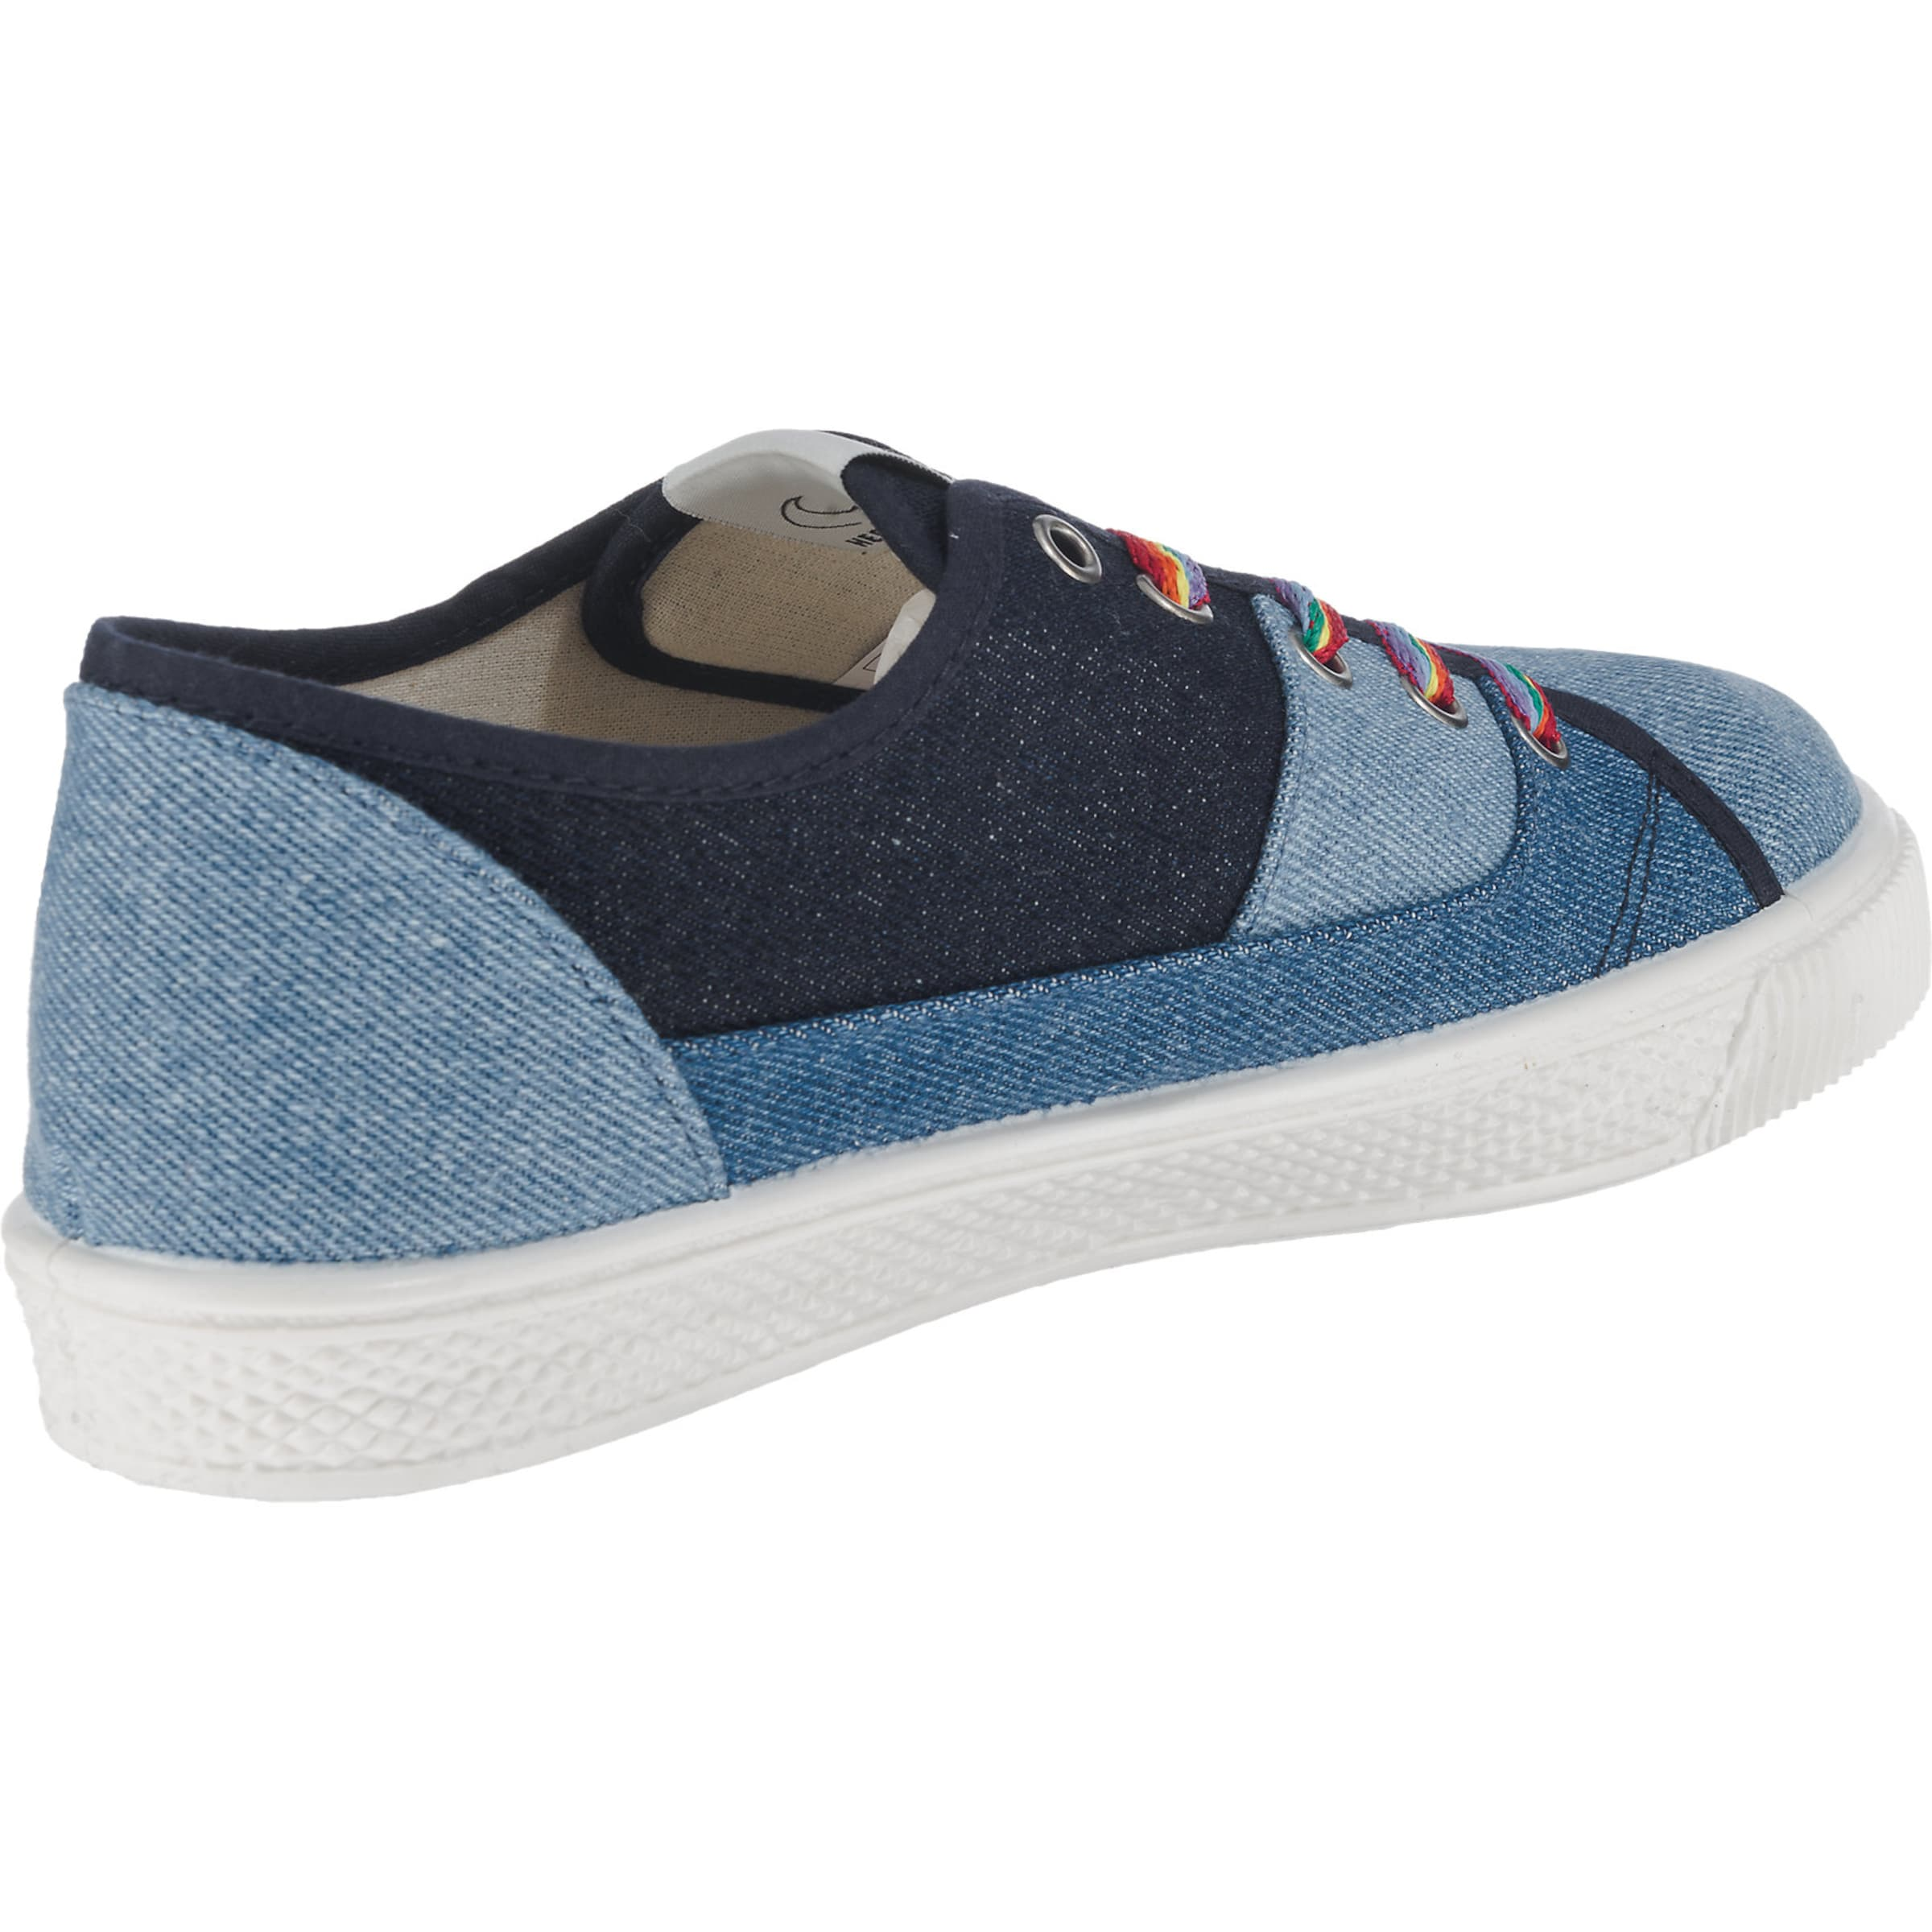 LEVI'S Malibu Lady Patch Sneakers Low Online-Shopping-Outlet Verkauf Modisch Empfehlen Verkauf Online Auslass Eastbay yJvvmjxCc